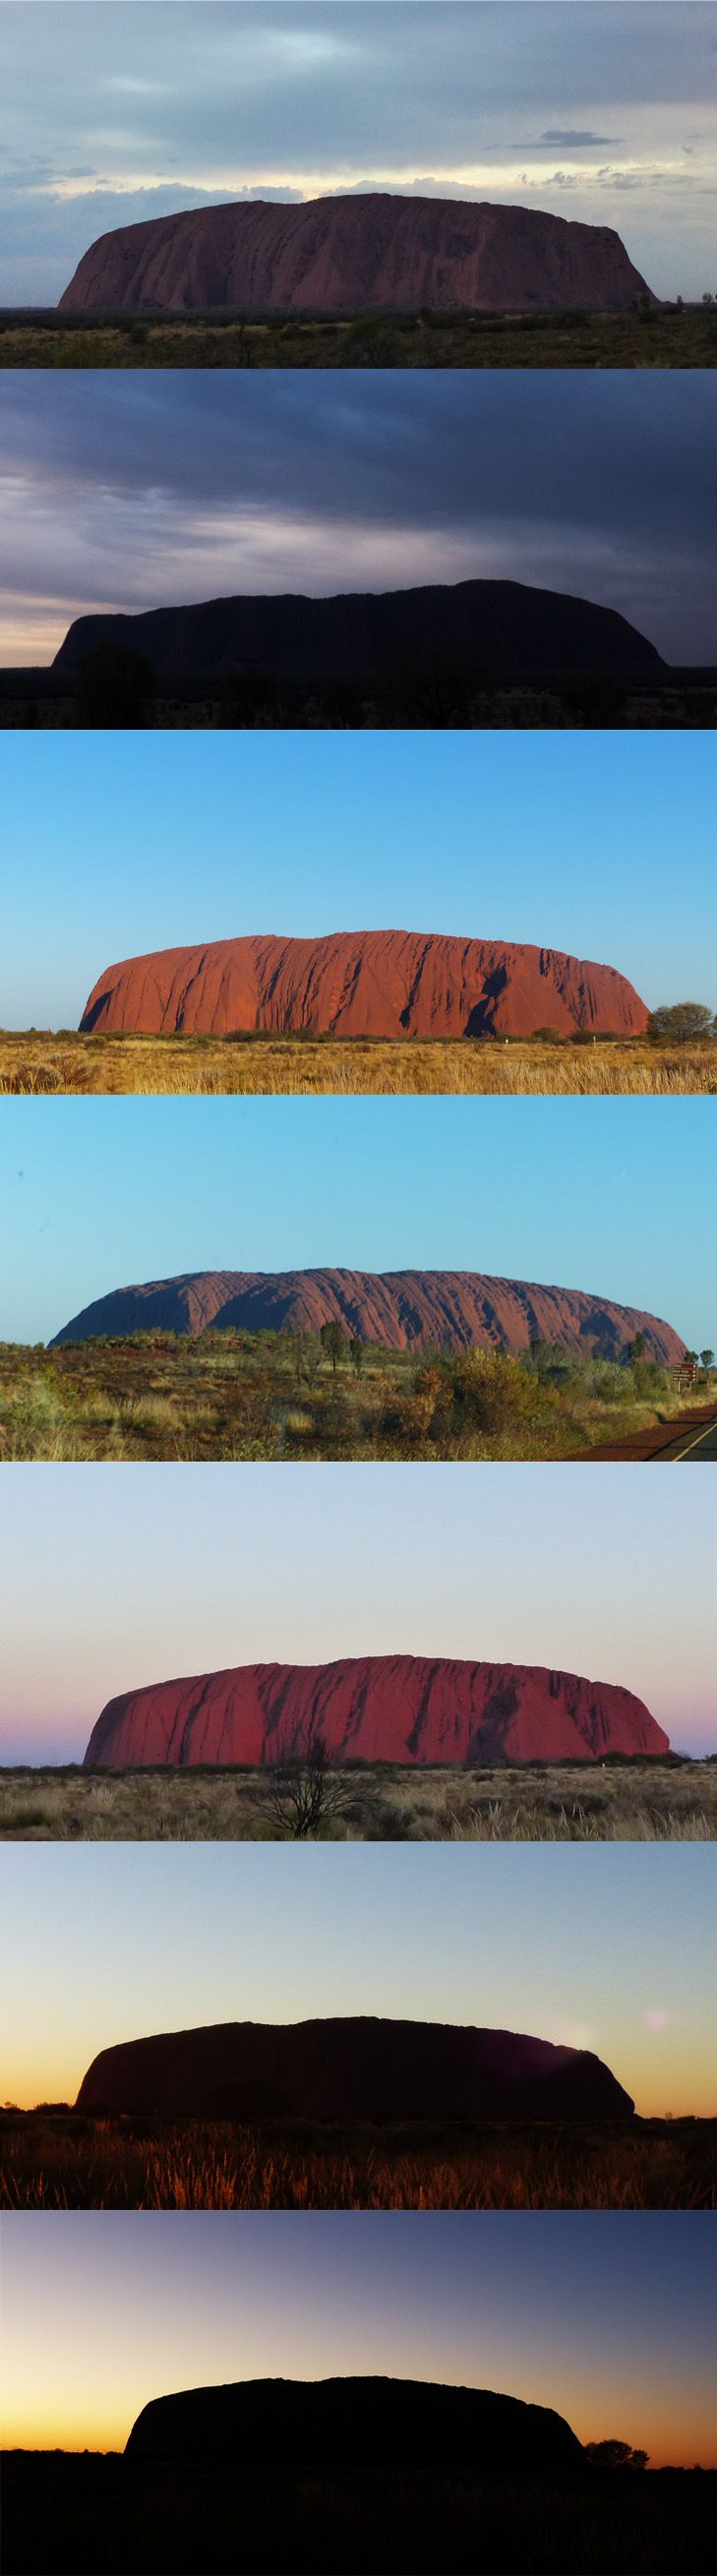 #Uluru #AyersRock #Australia